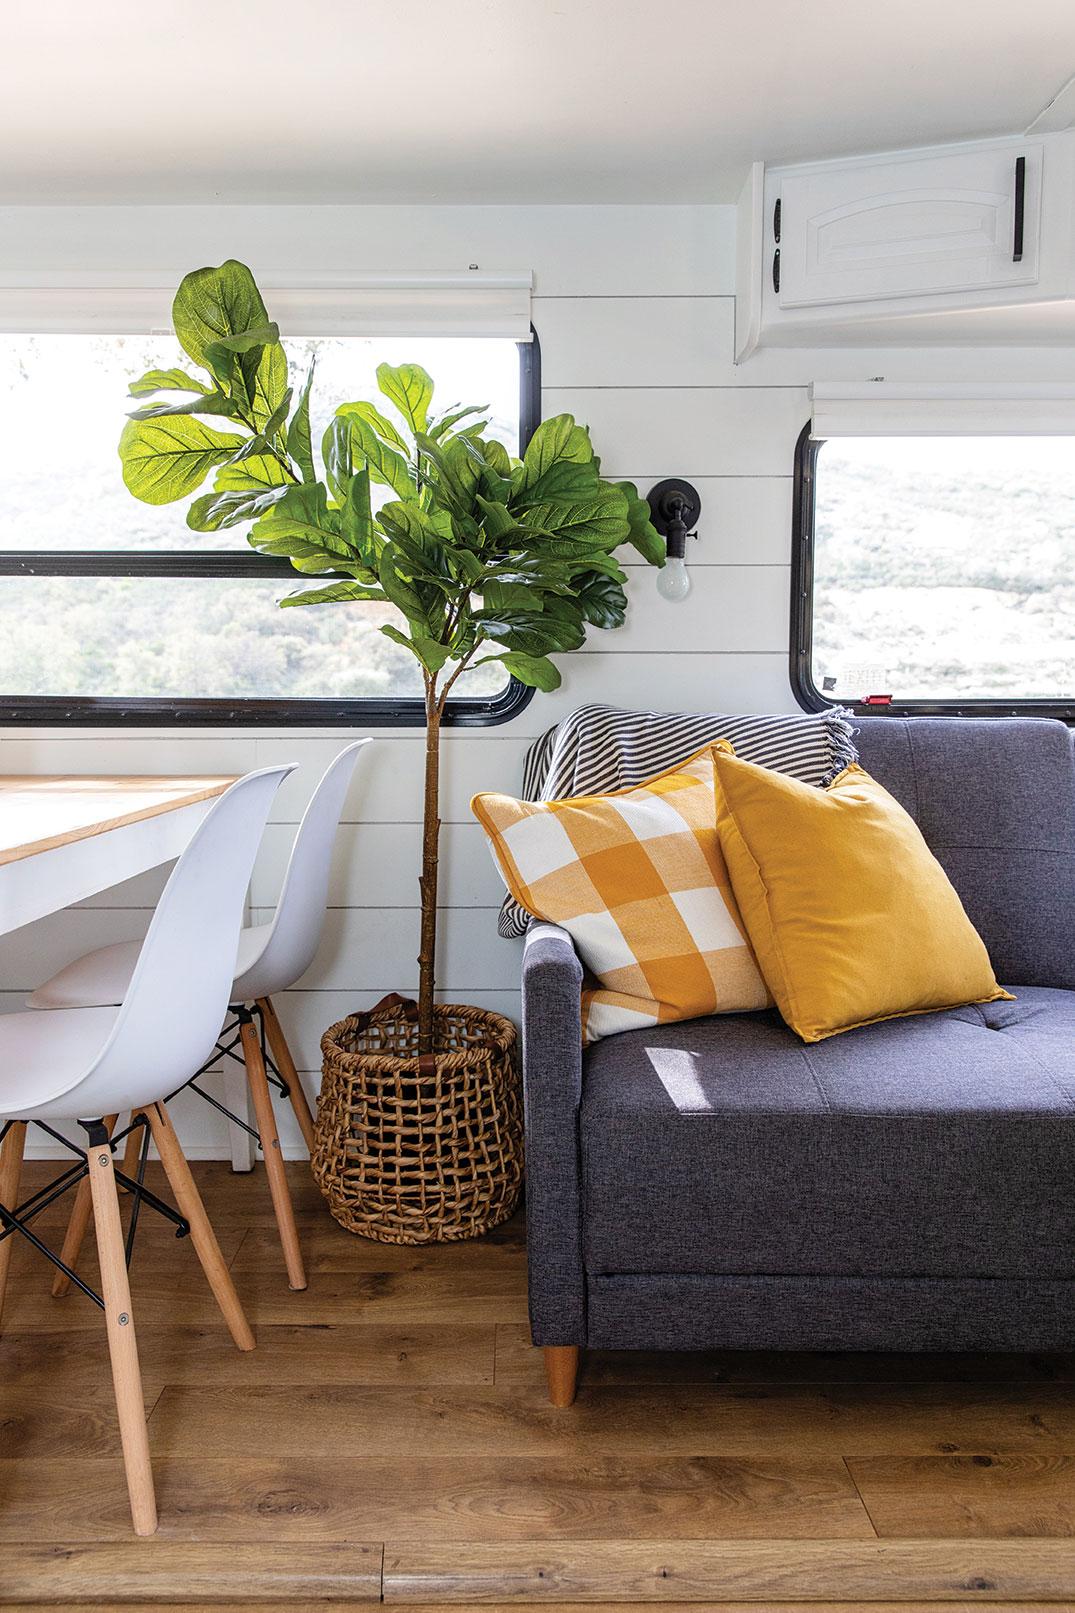 walker campers RV trailer camper rentals san diego design decor